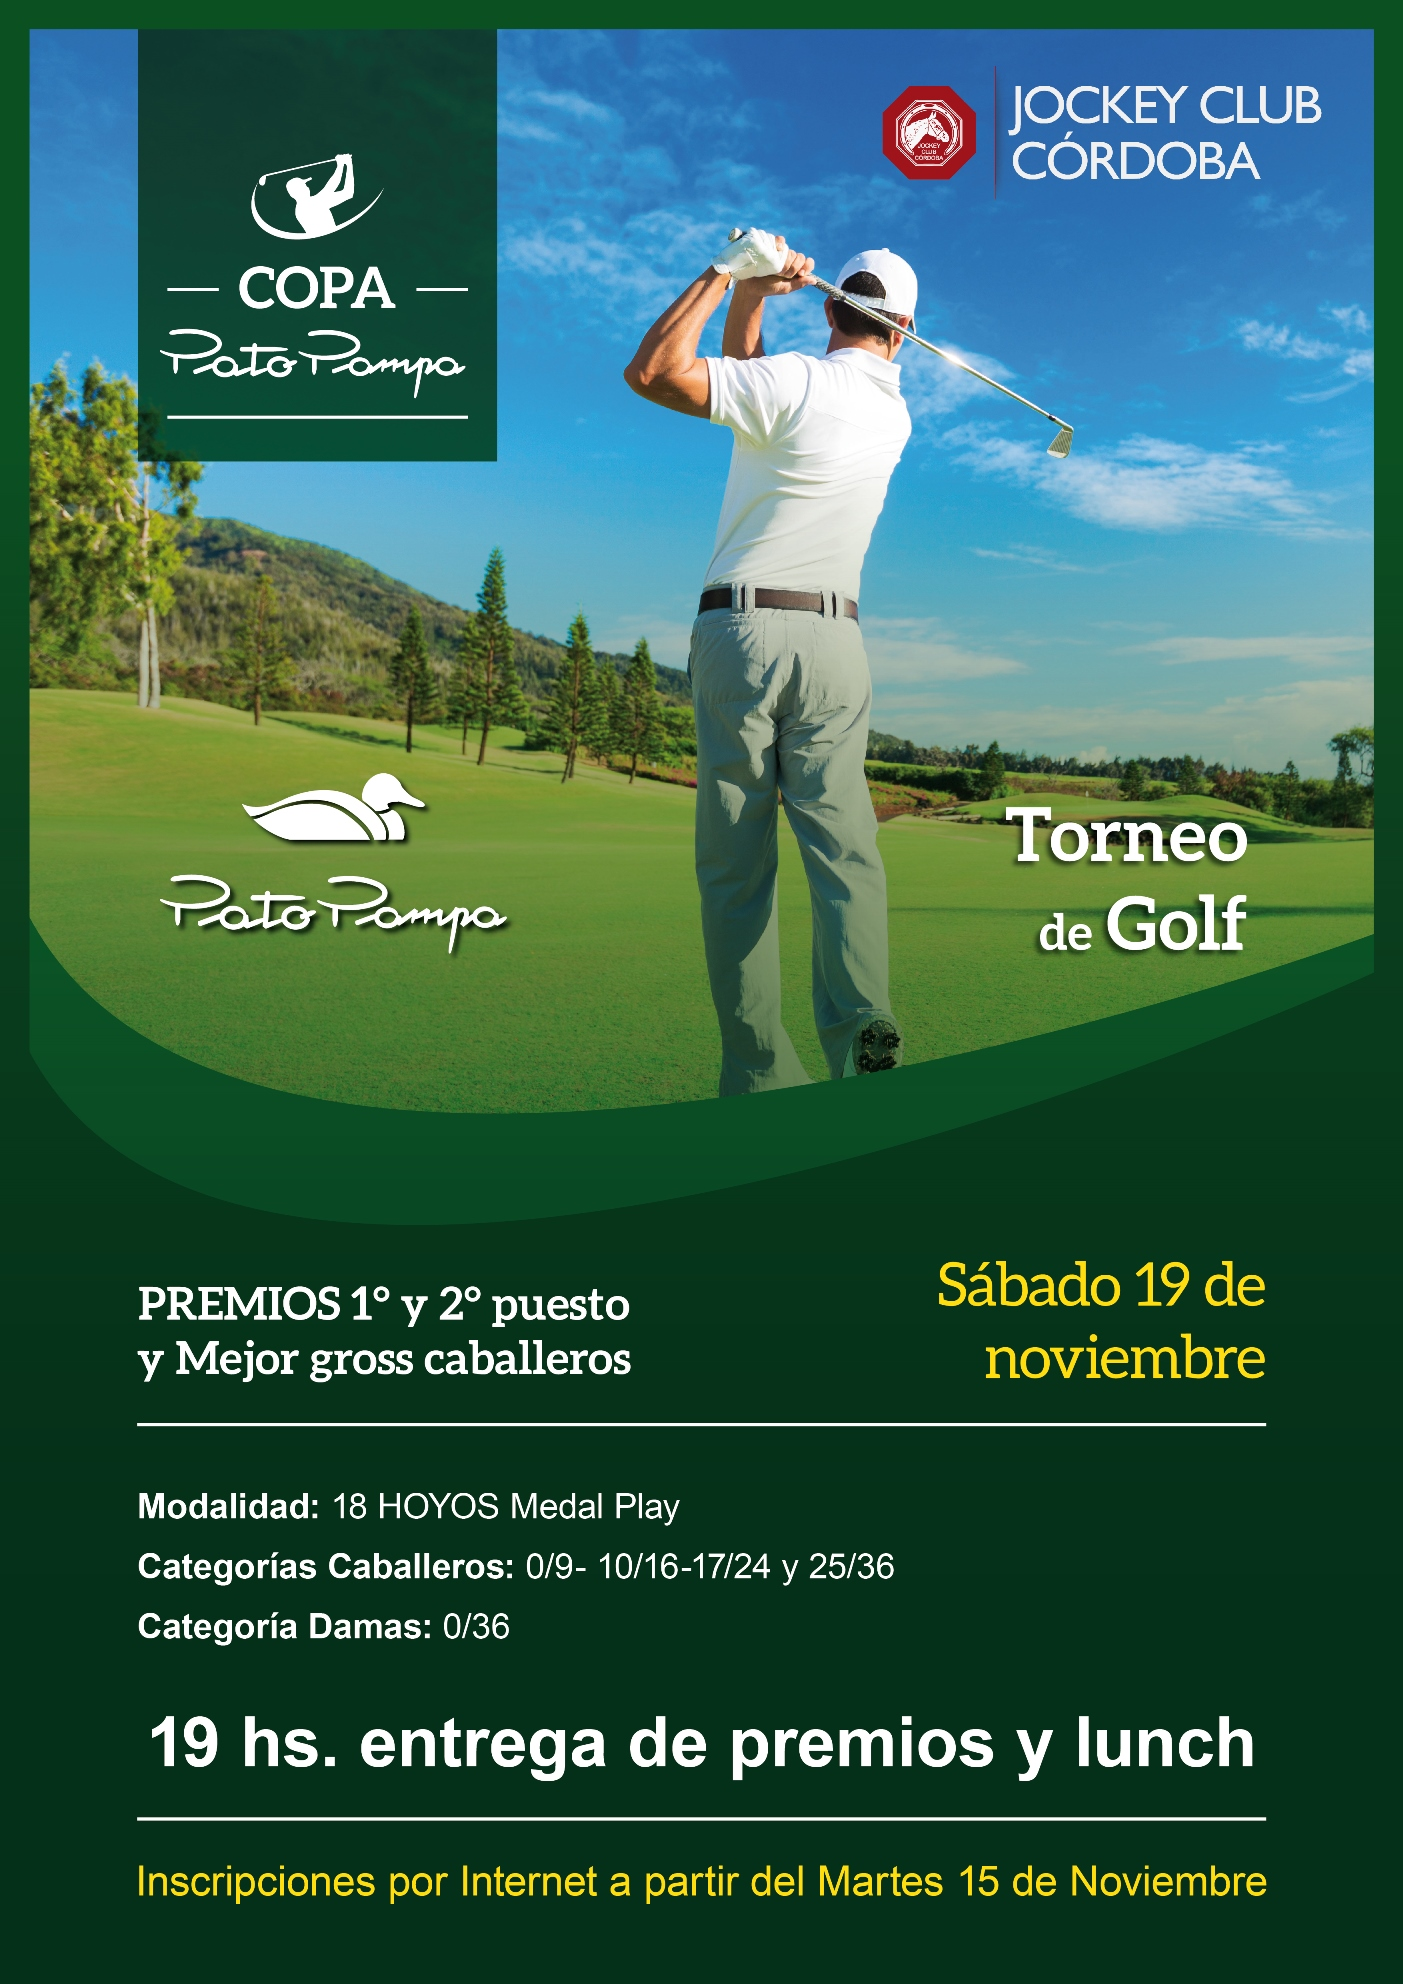 afiche torneo golf jockey